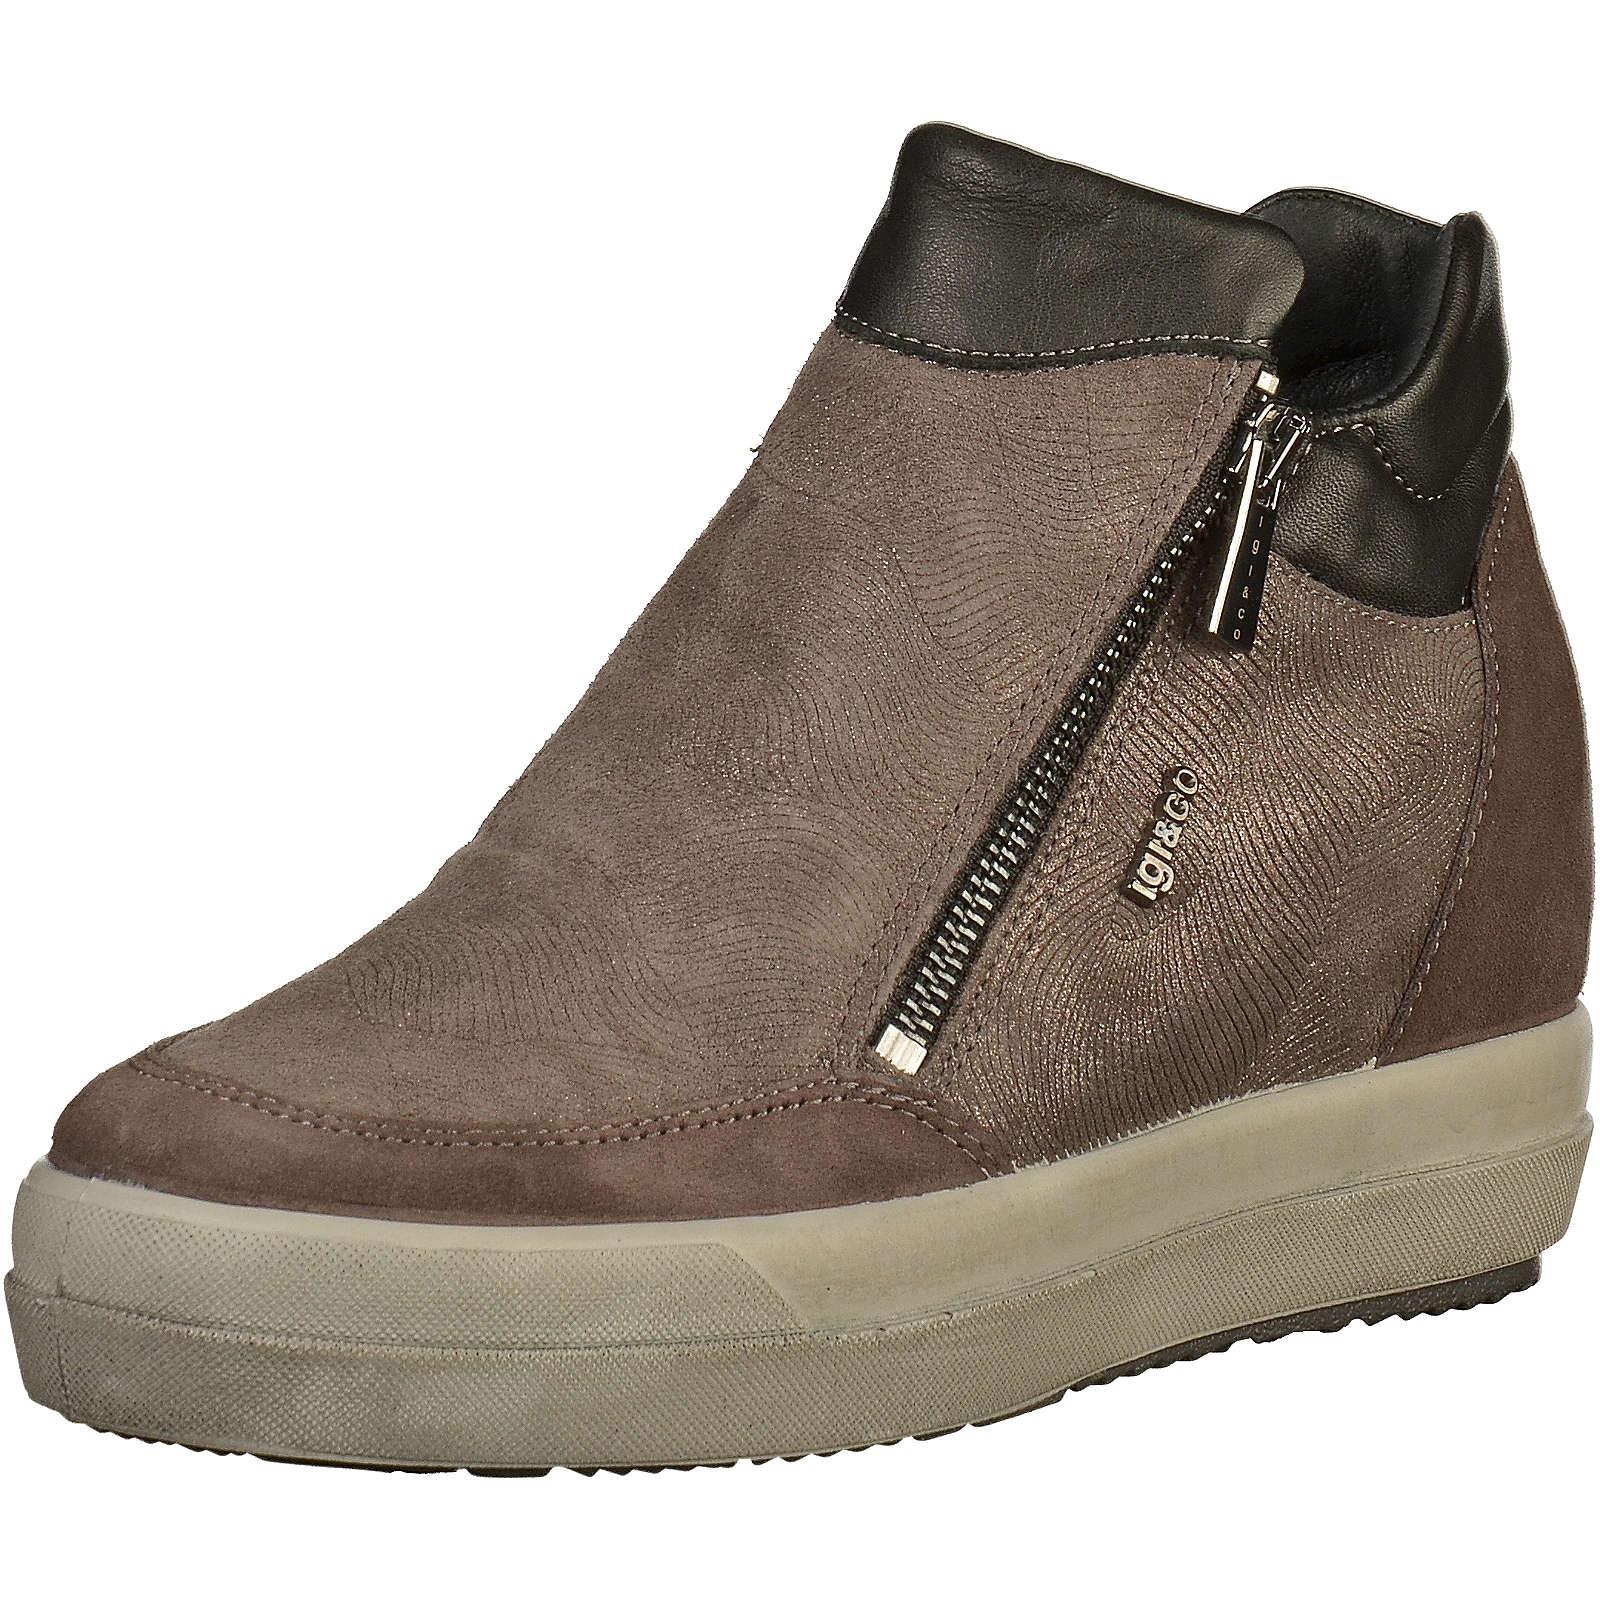 IGI & CO Sneaker Sneakers High anthrazit Damen Gr. 36